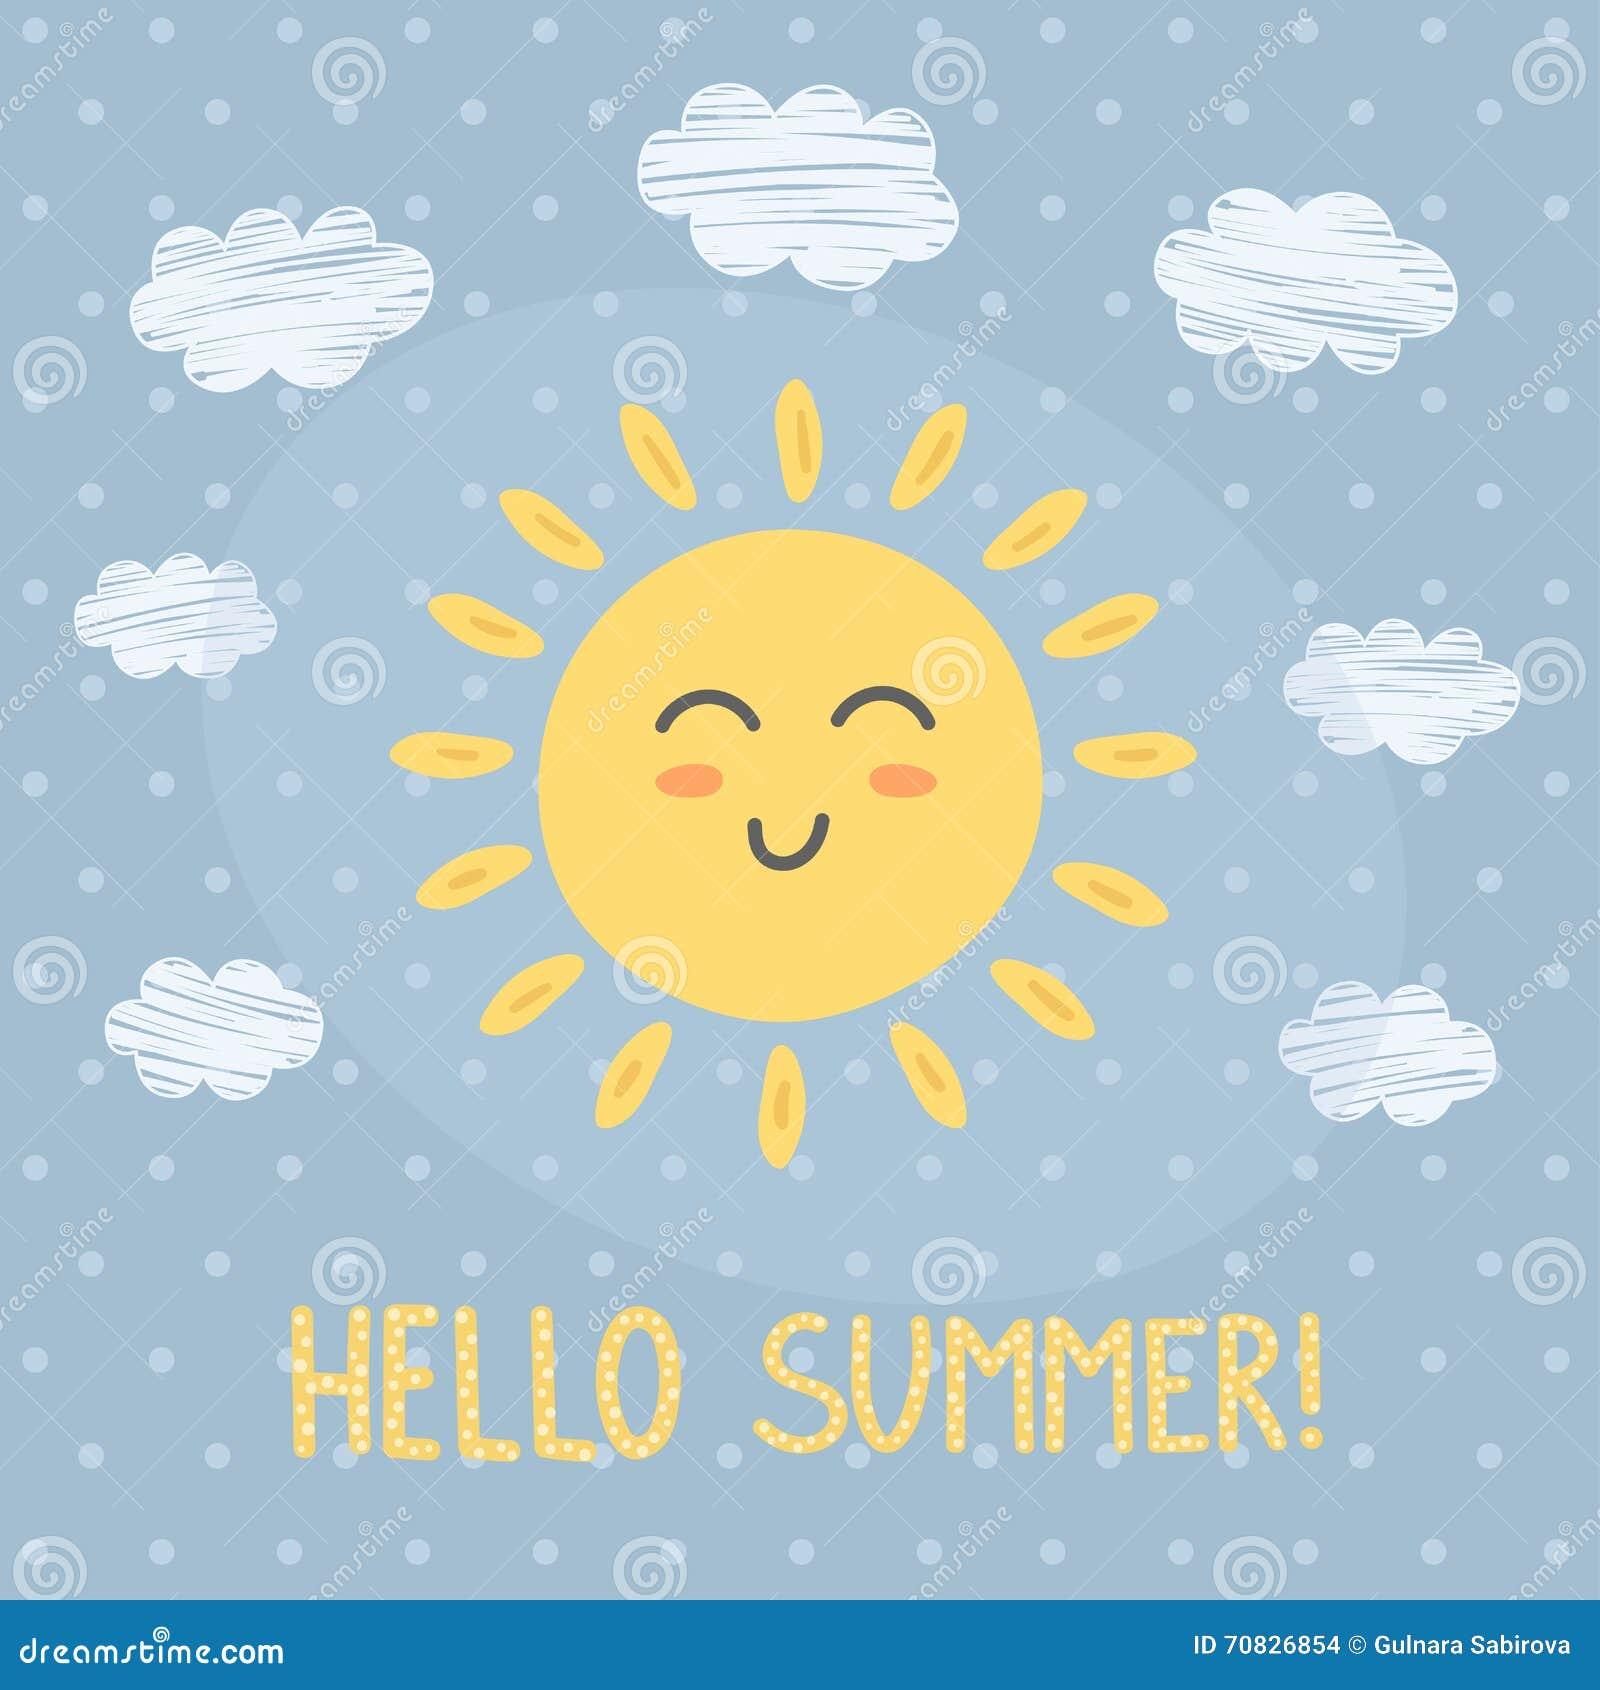 Hello Summer Card With A Cute Sun Stock Vector - Image: 70826854